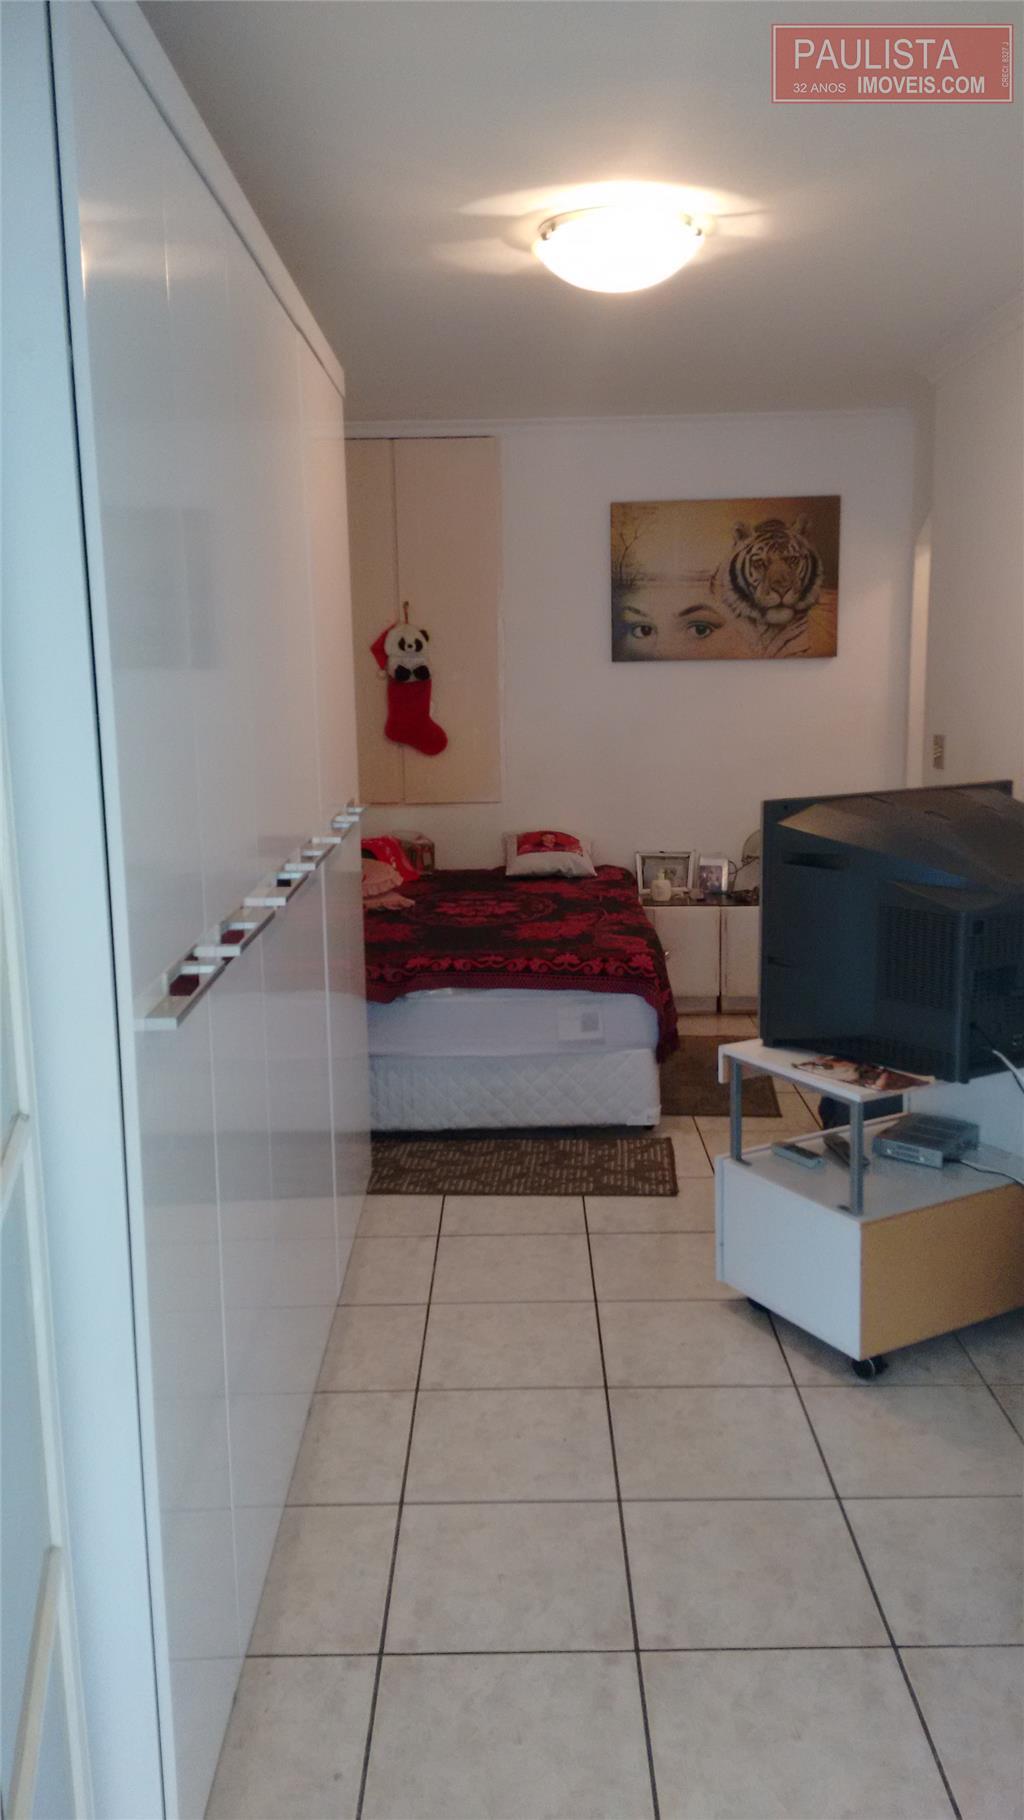 Casa 3 Dorm, Vila Santa Catarina, São Paulo (CA1089) - Foto 19